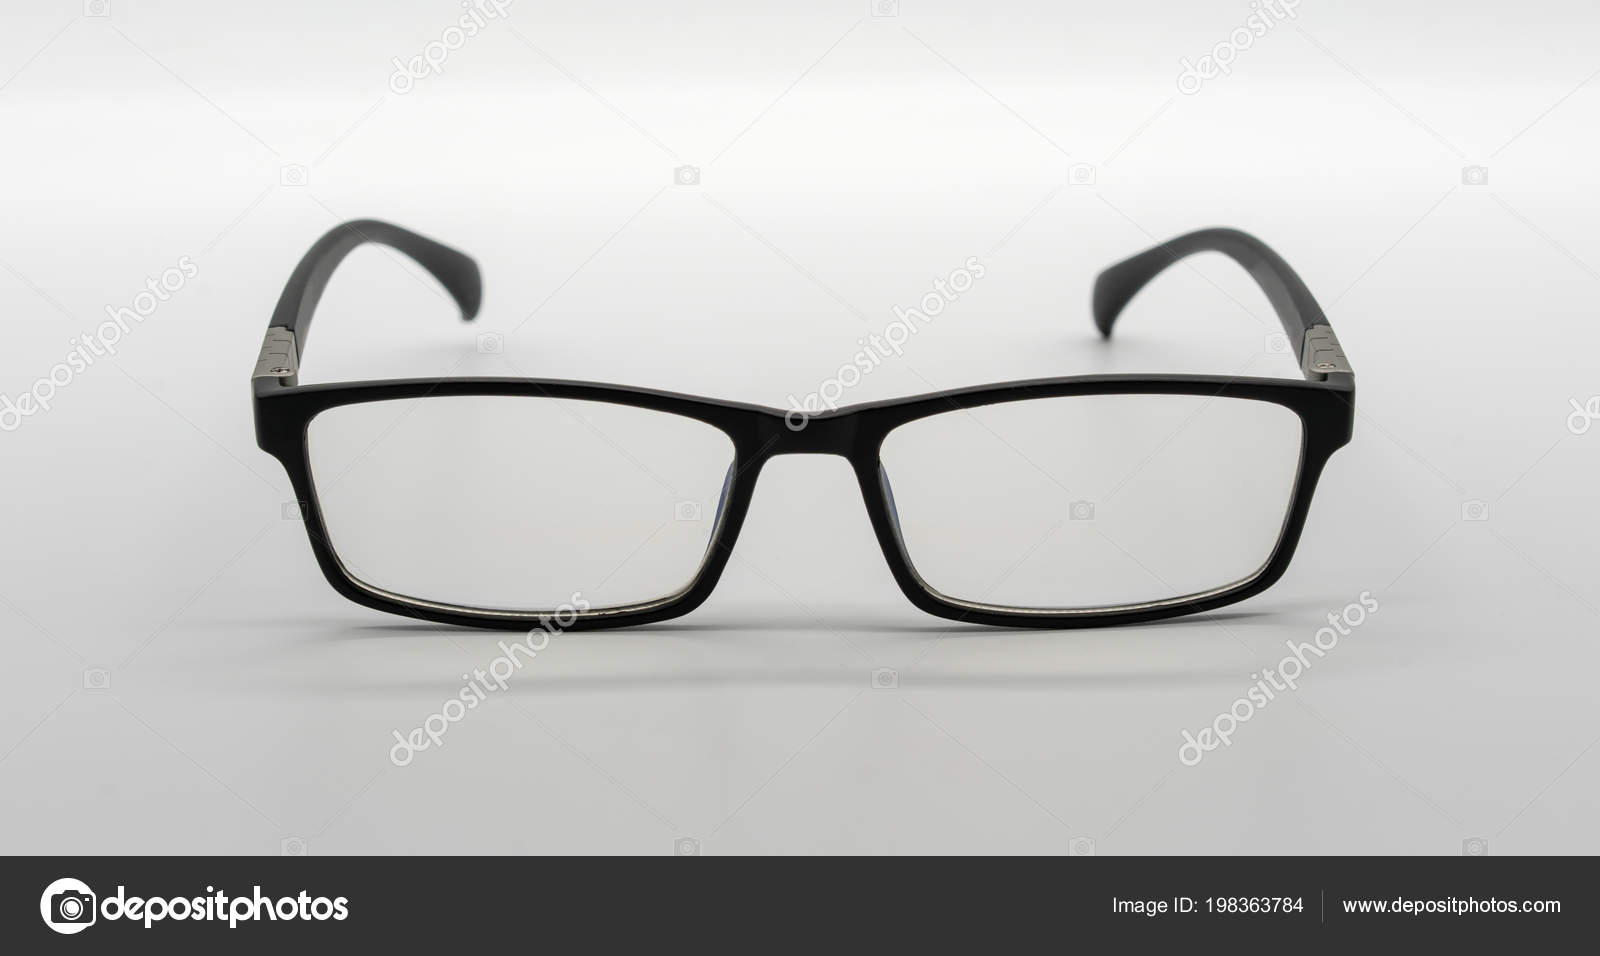 Black Plastic Eye Wear Eye Glasses Isolated White Background